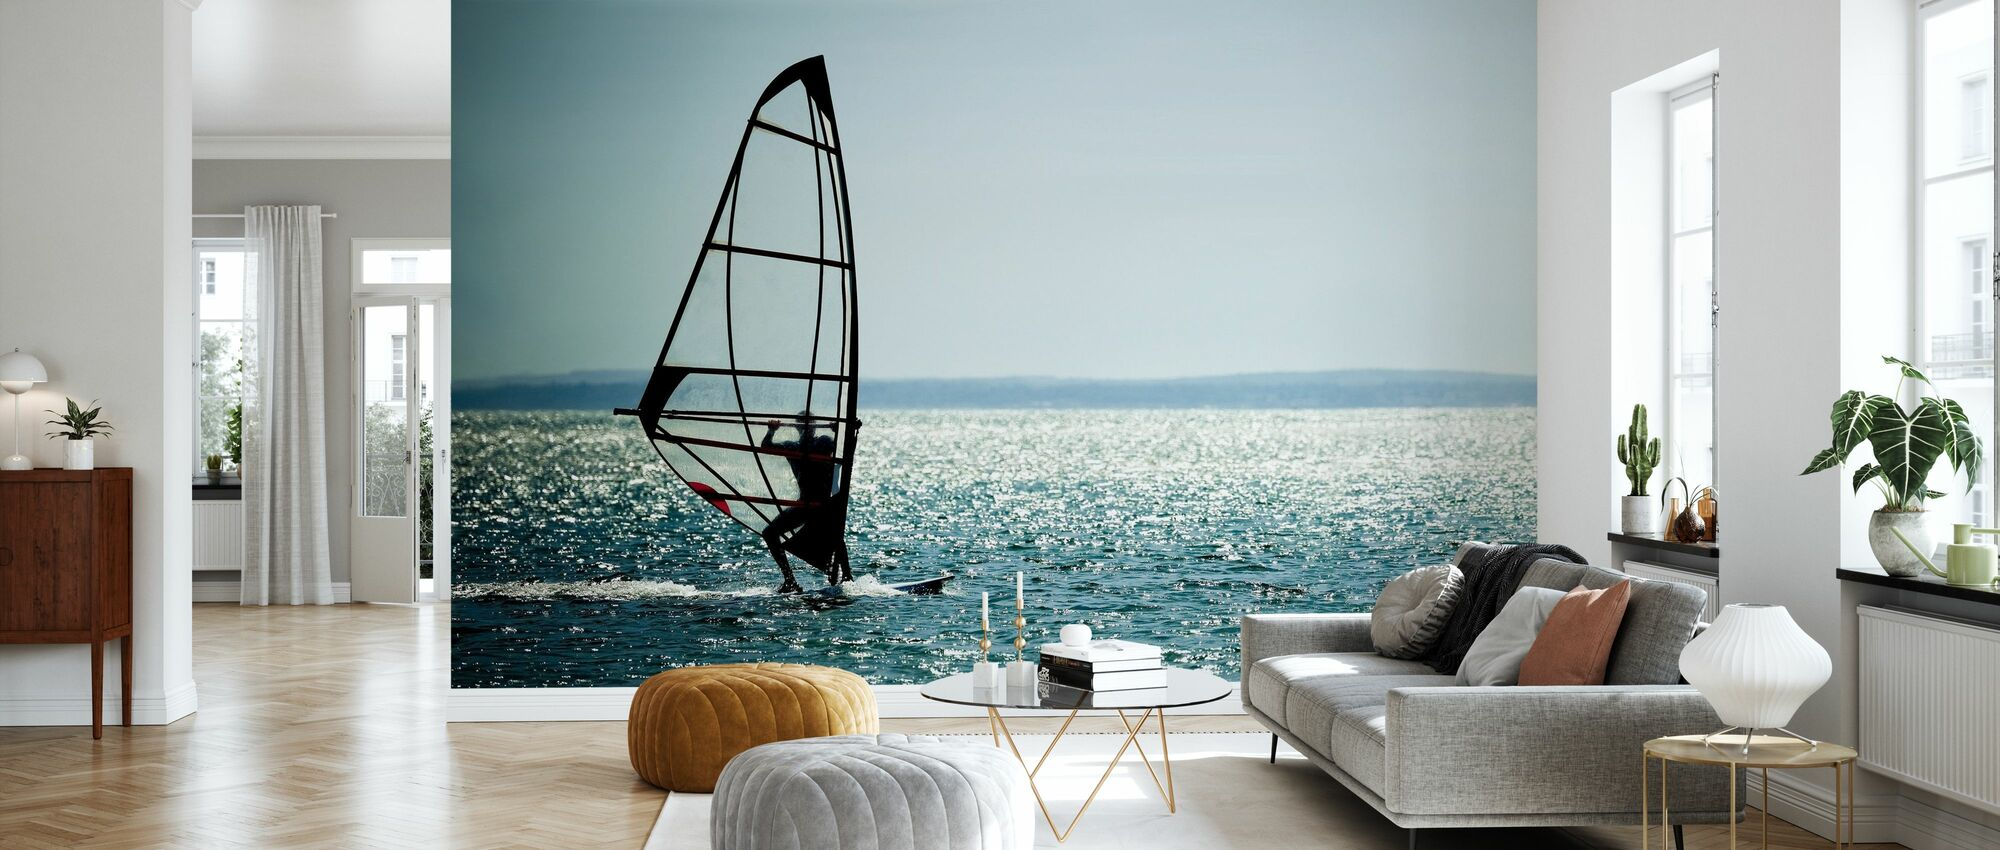 Windsurfer Panorama - Wallpaper - Living Room